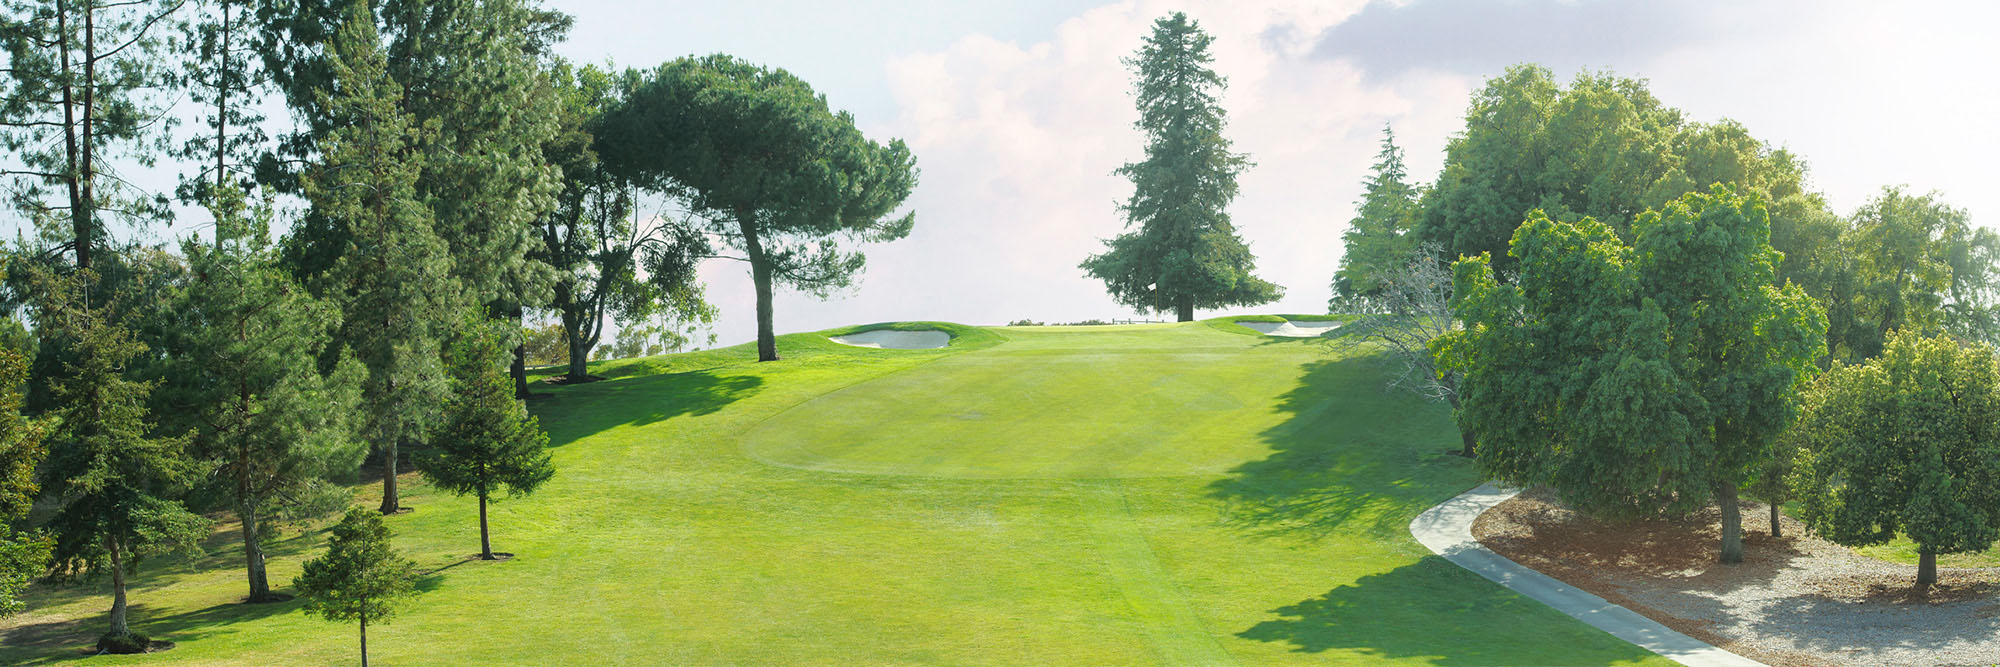 Golf Course Image - San Jose Country Club No. 3